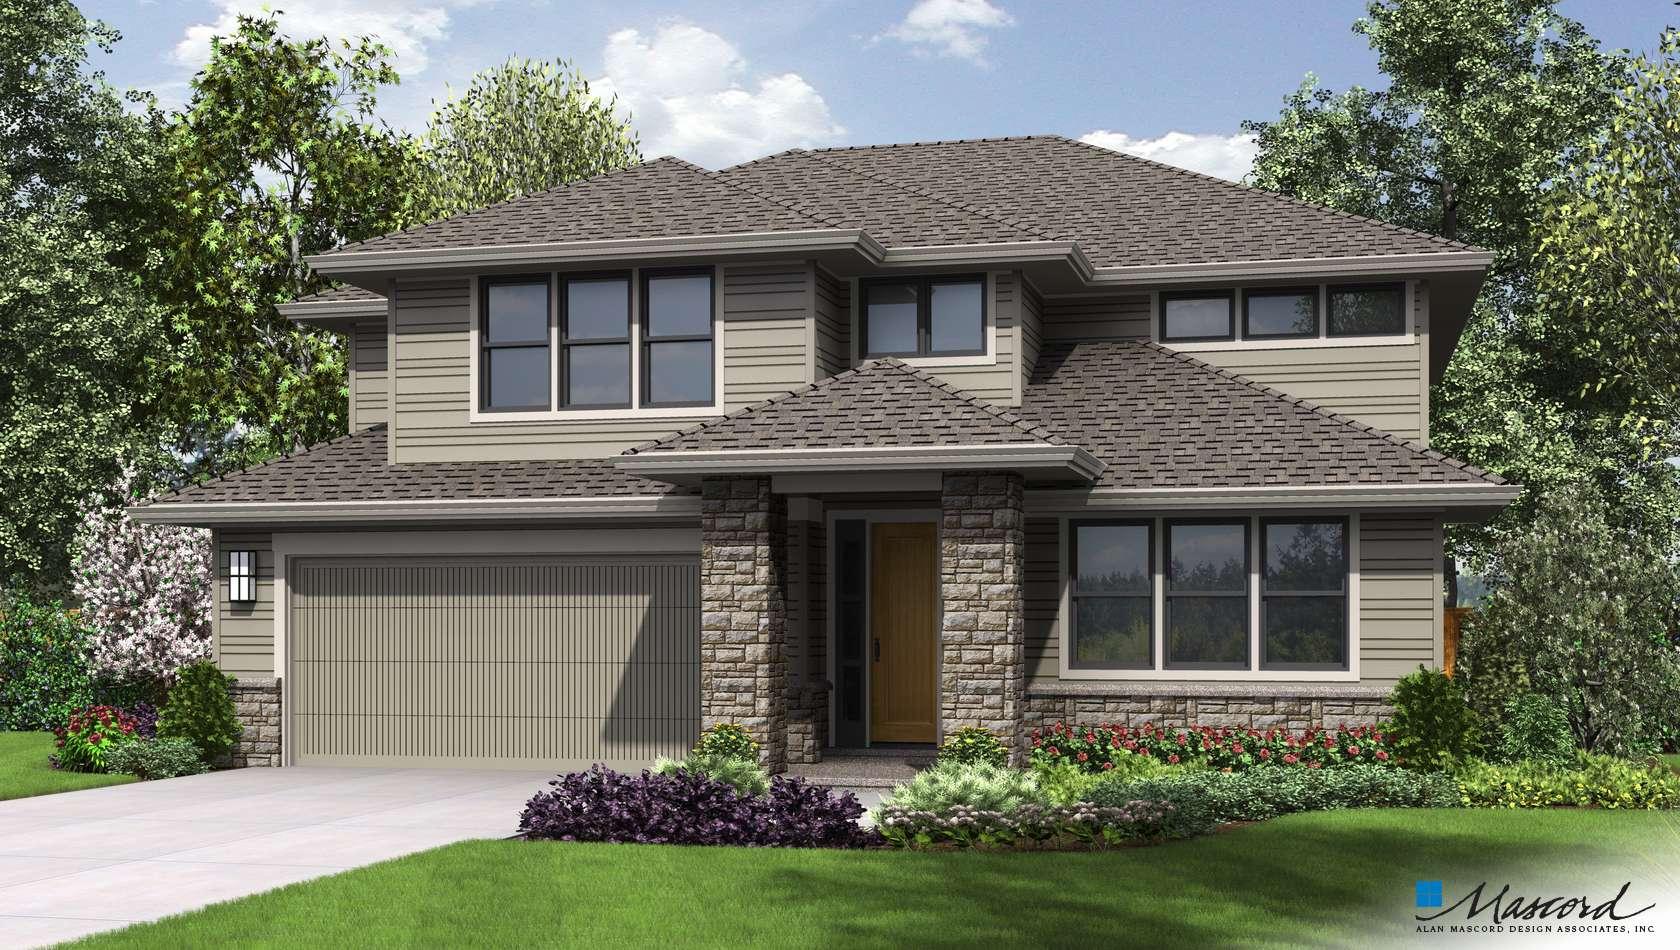 Main image for house plan 2230CG: The Gardena